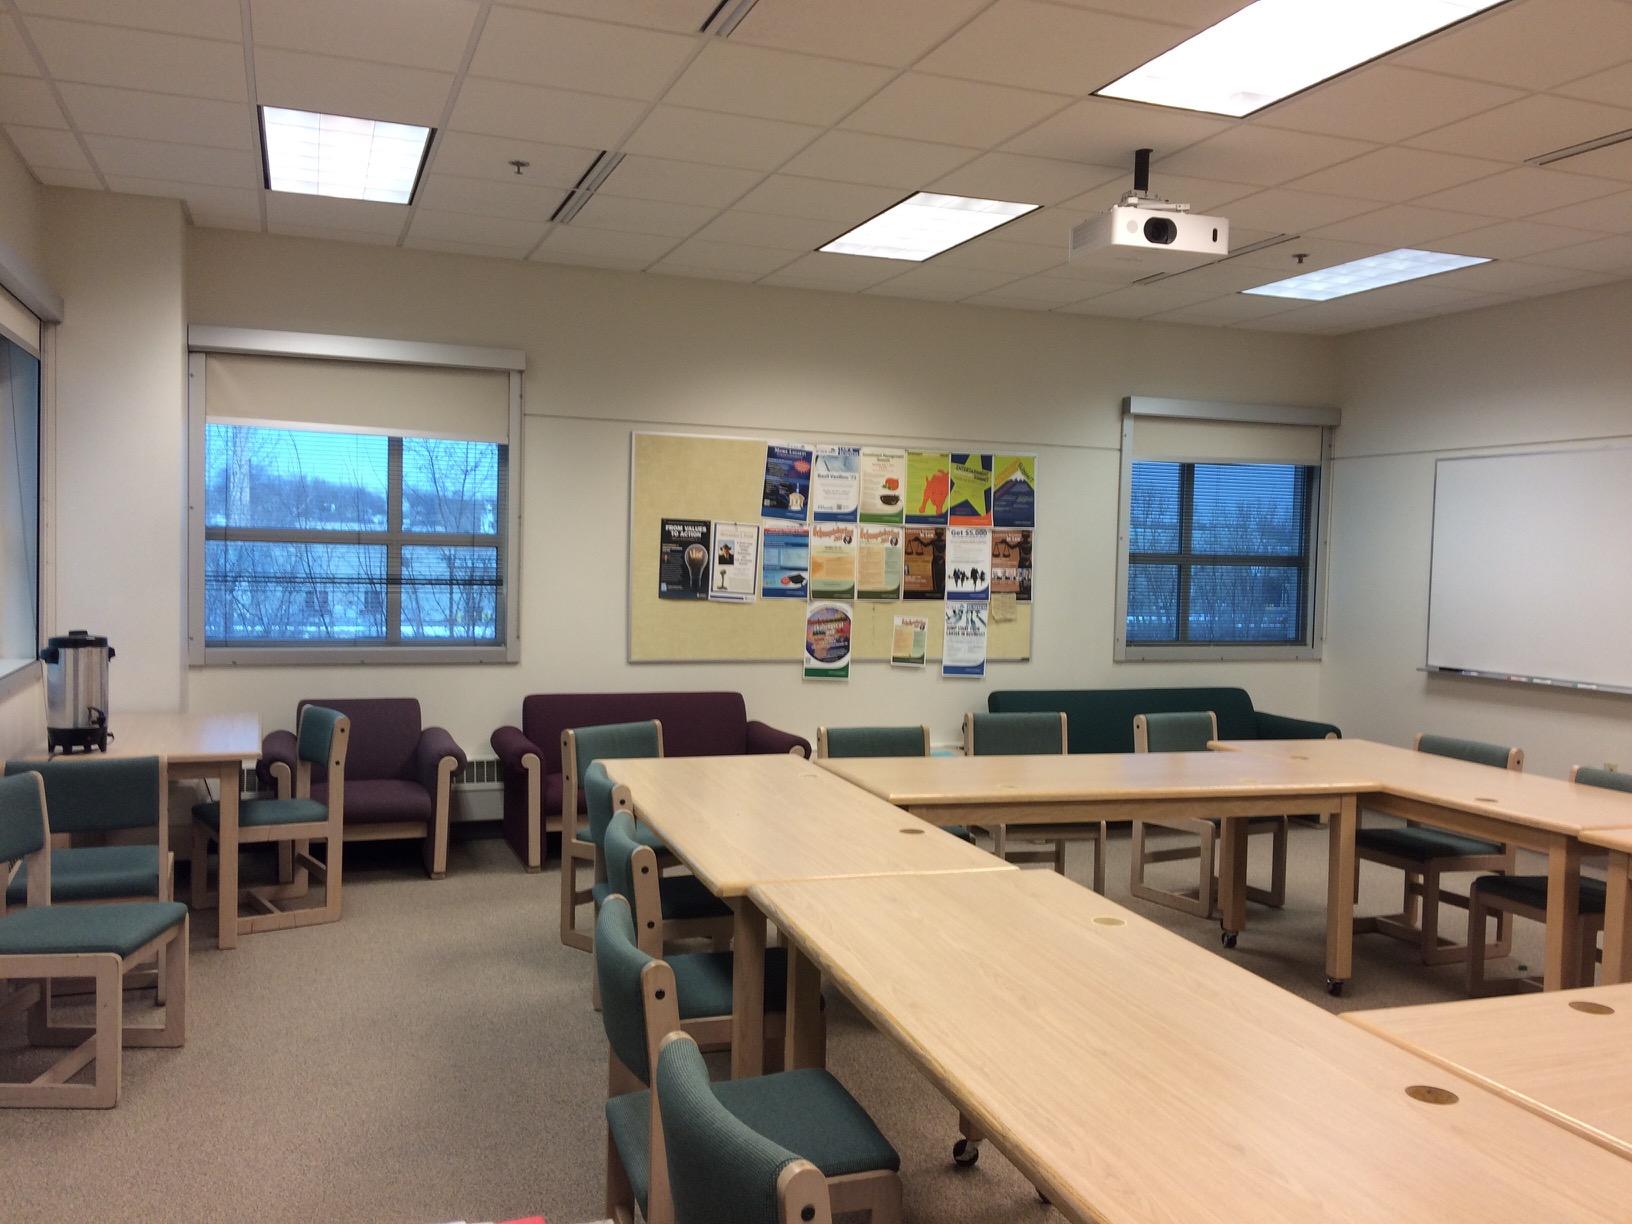 Classroom hookup 2